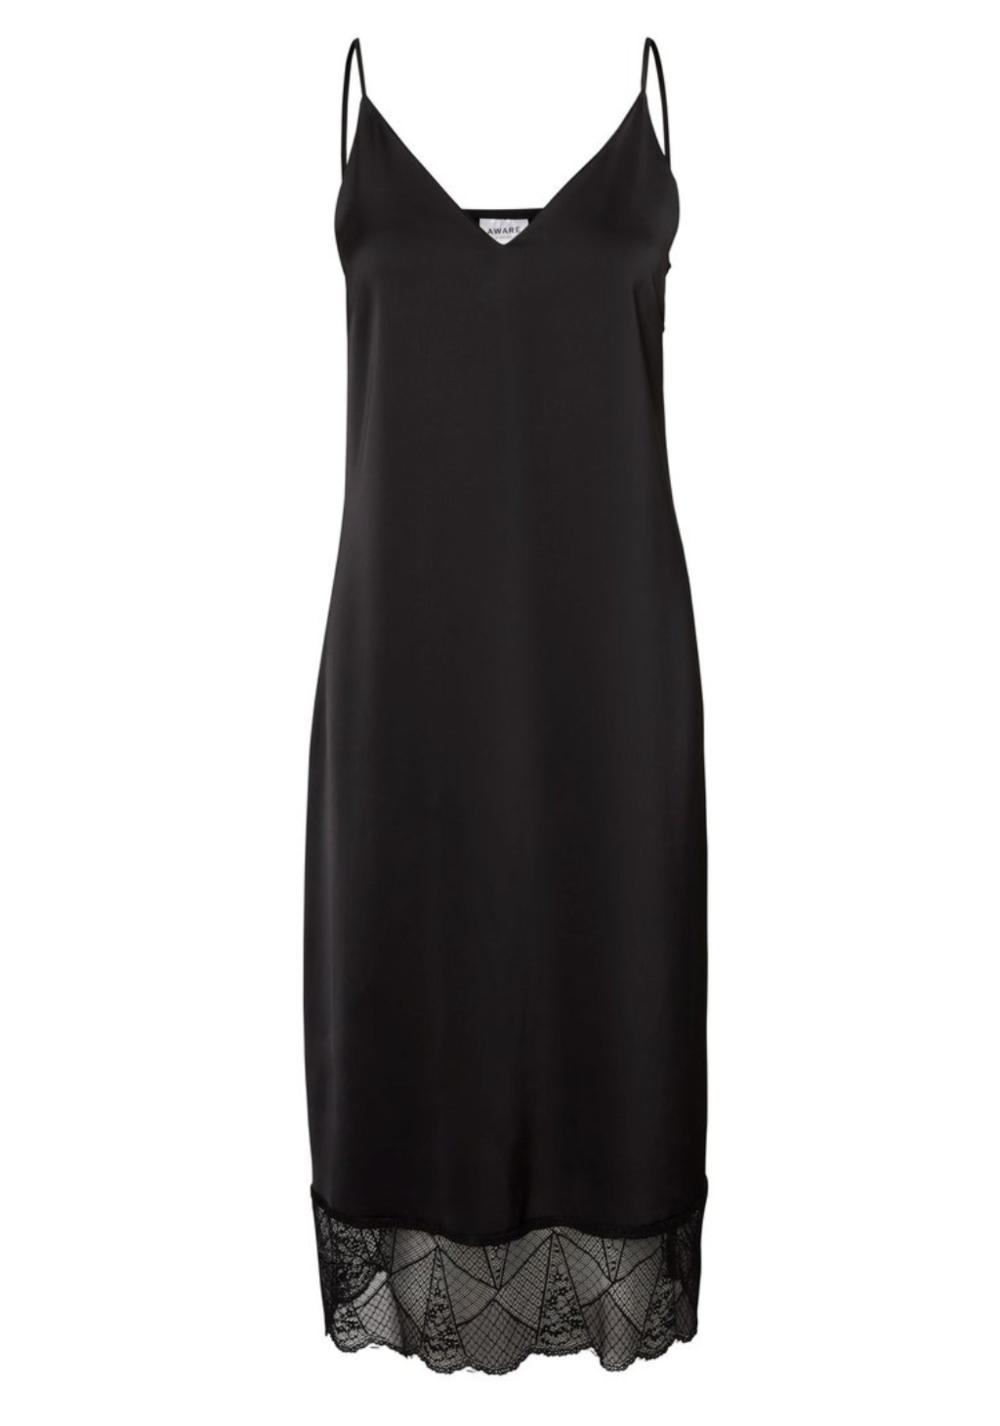 Vero Moda Black Slip Dress - from Born at Dawn